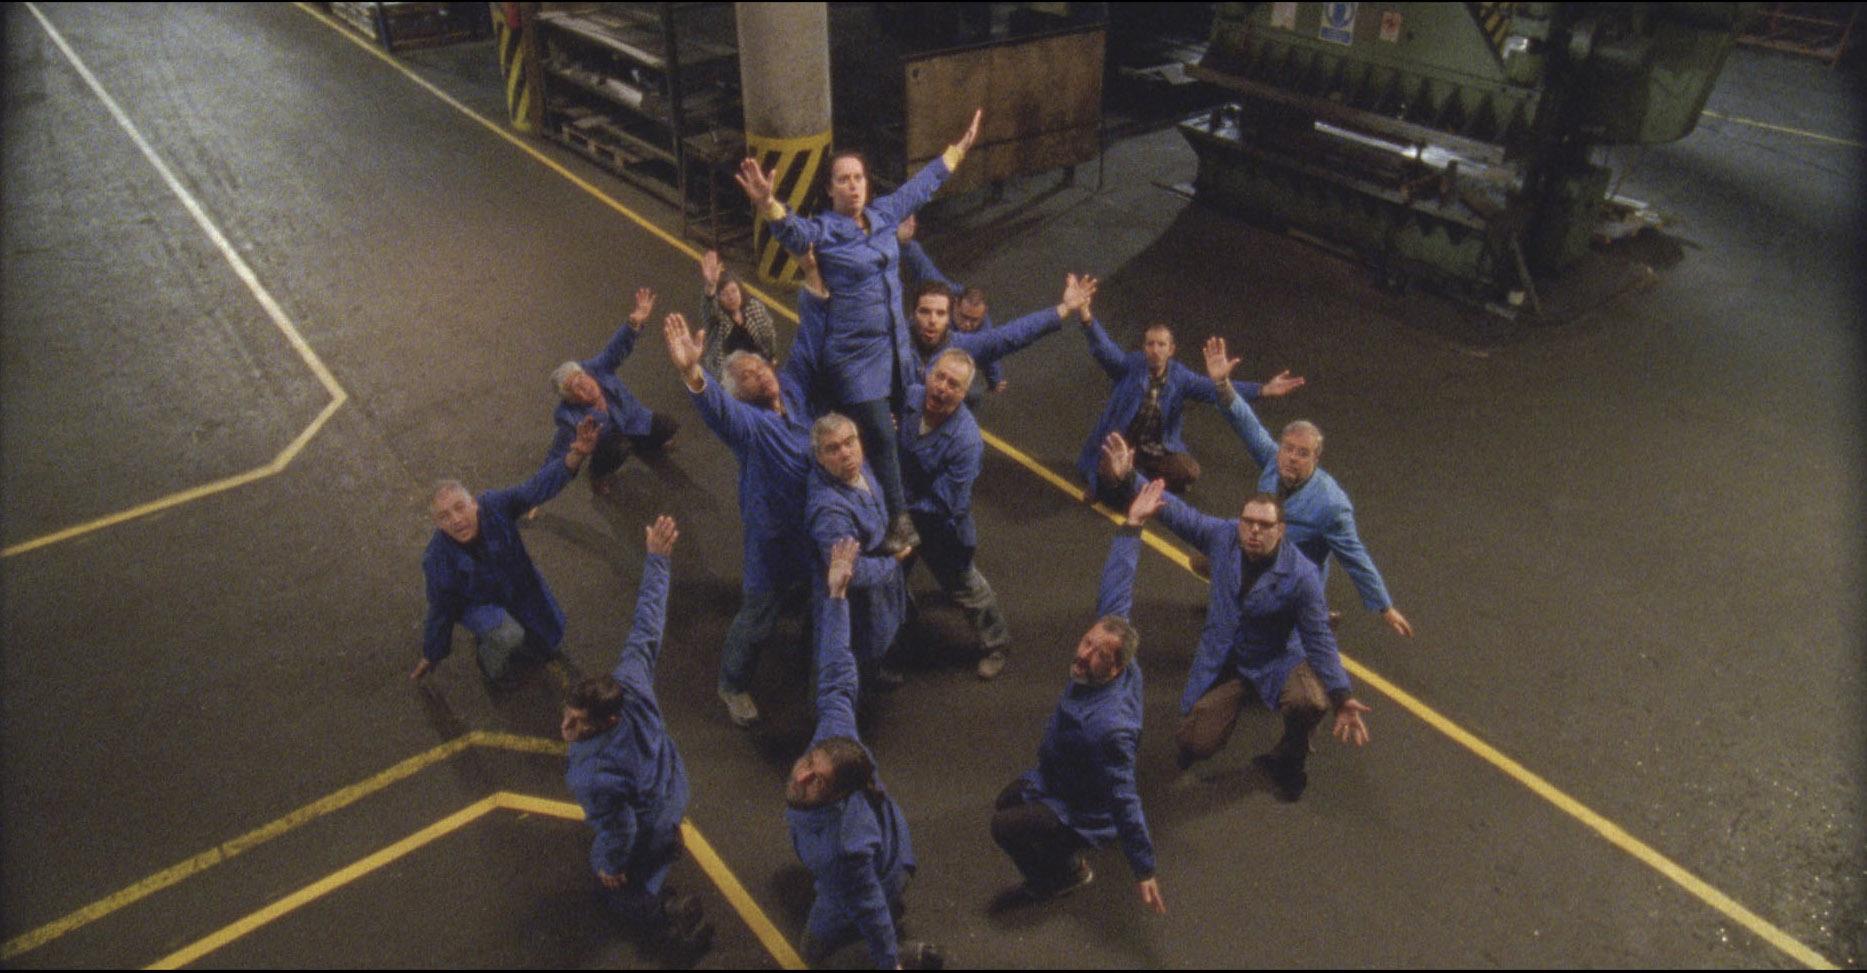 L'usine de rien, film choral